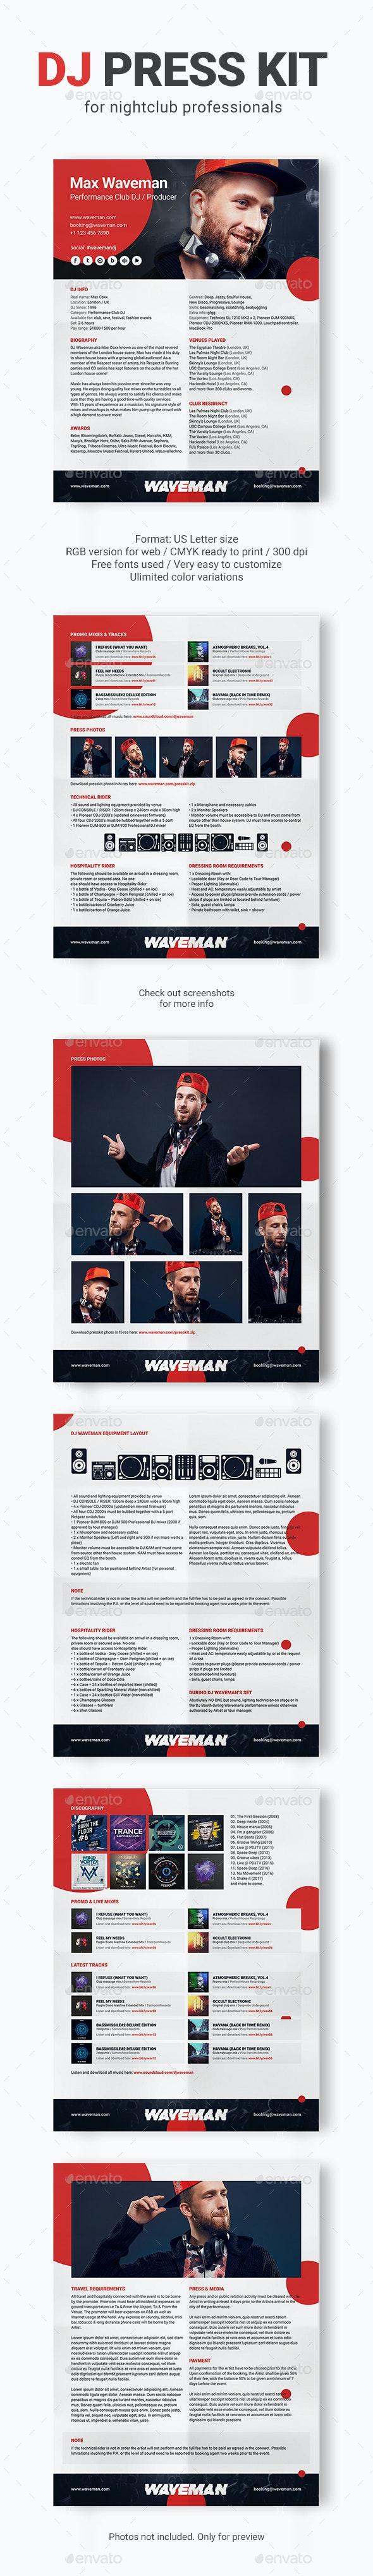 PromoDJ - DJ Press Kit / DJ Resume / DJ Rider PSD Template - Resumes Stationery